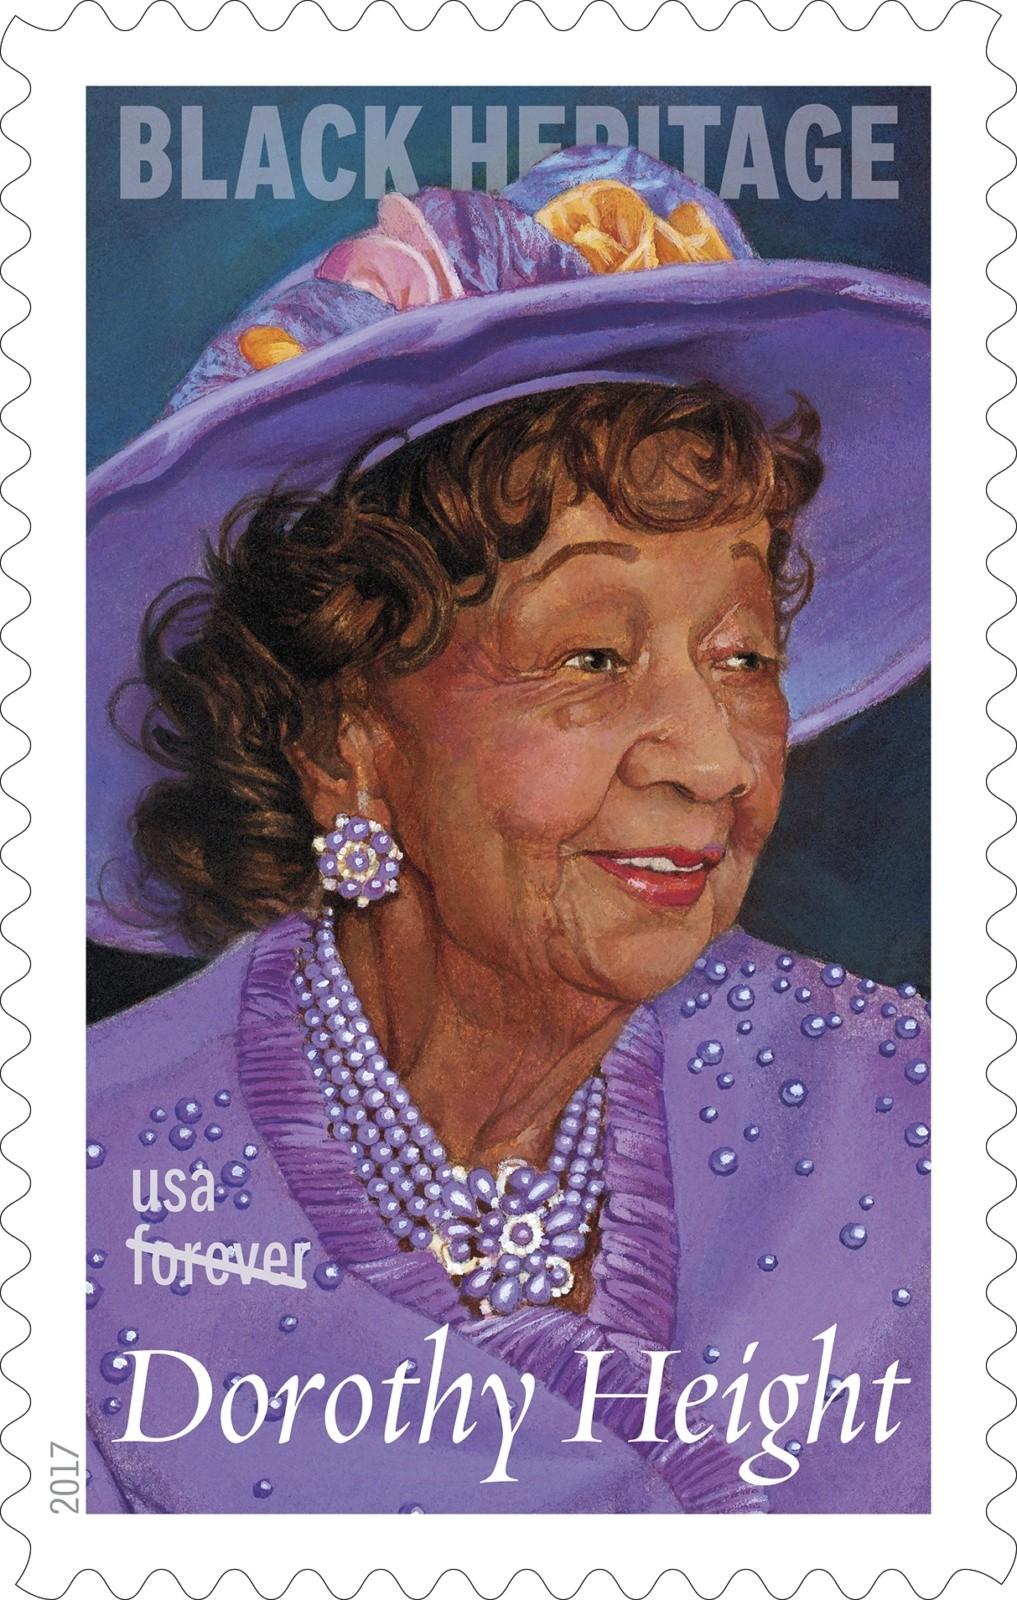 Dorothy Height Honored On U.S. Postal Stamp